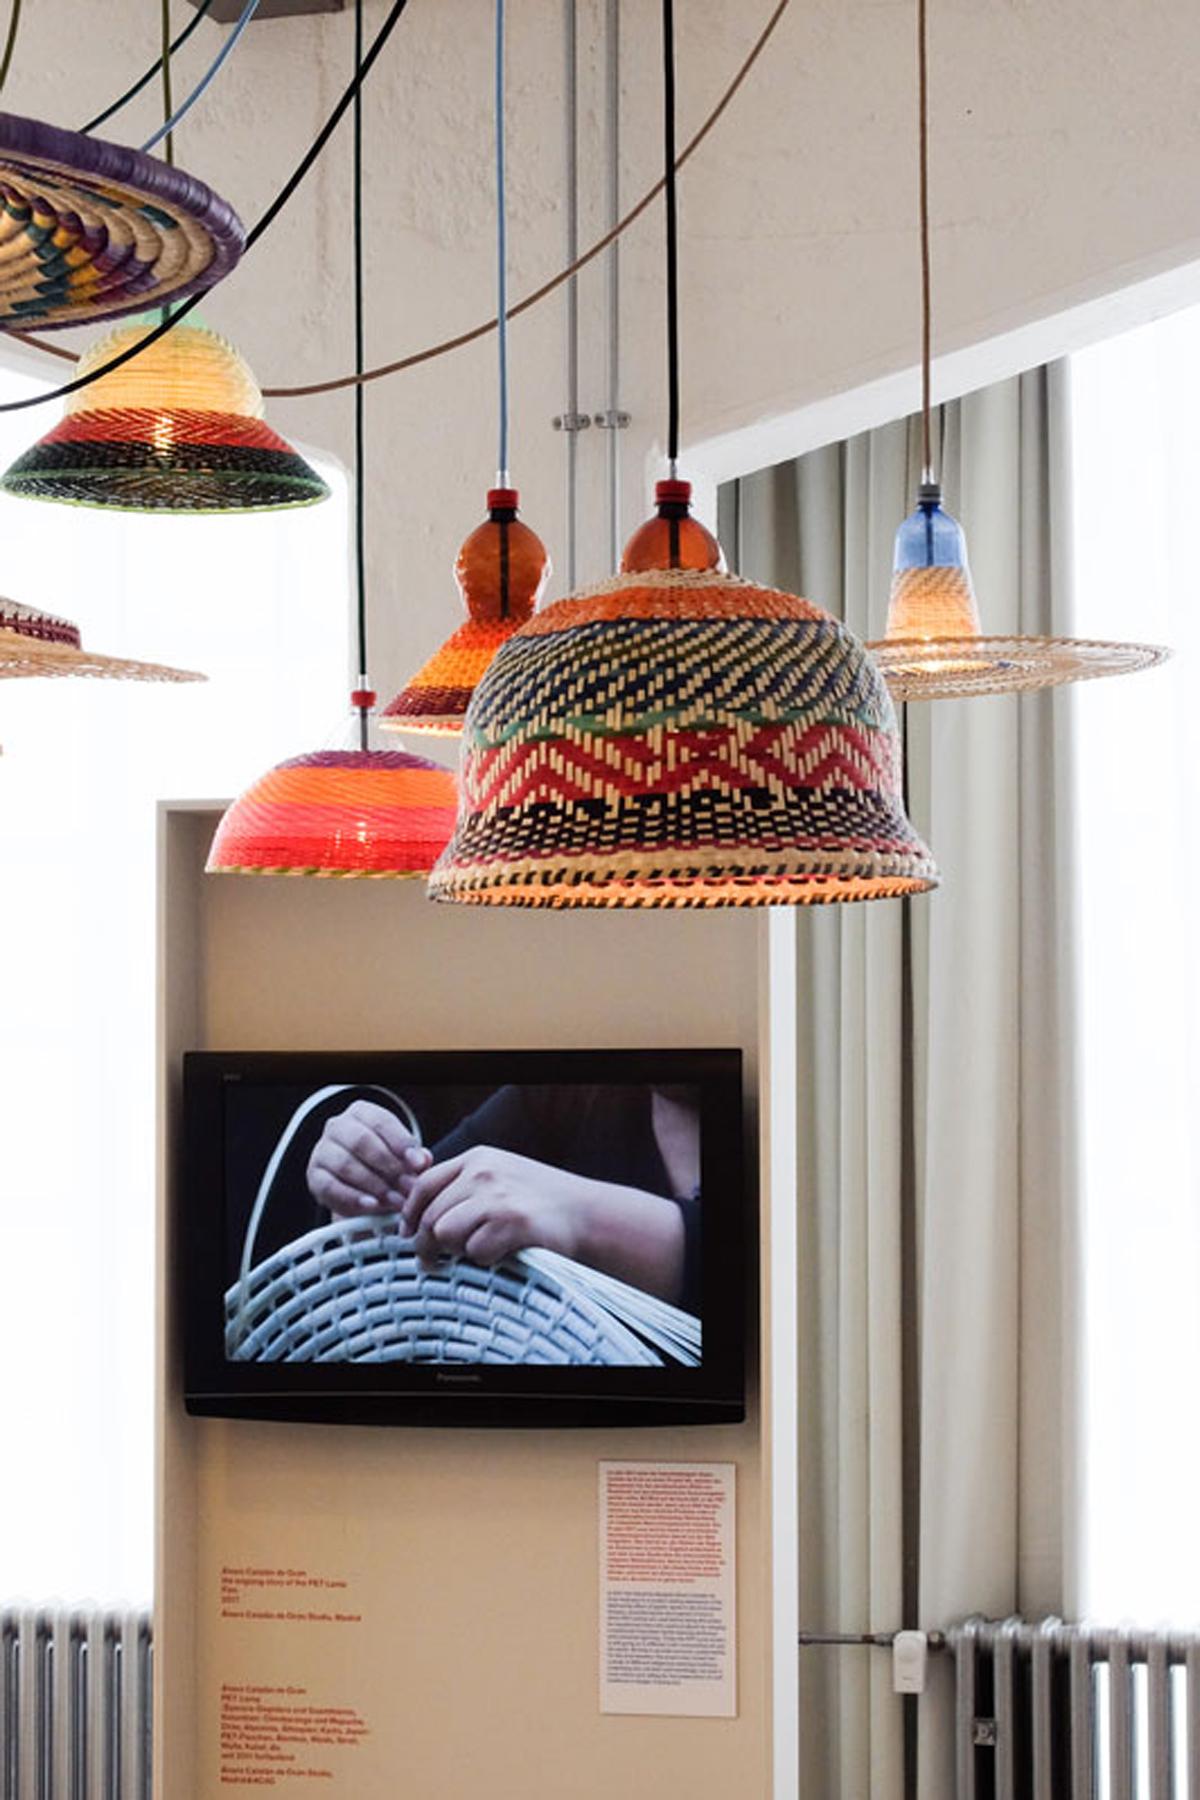 Pet Lamp de alvaro catalan de ocon en la escuela Bauhaus Craft becomes modern diariodesign